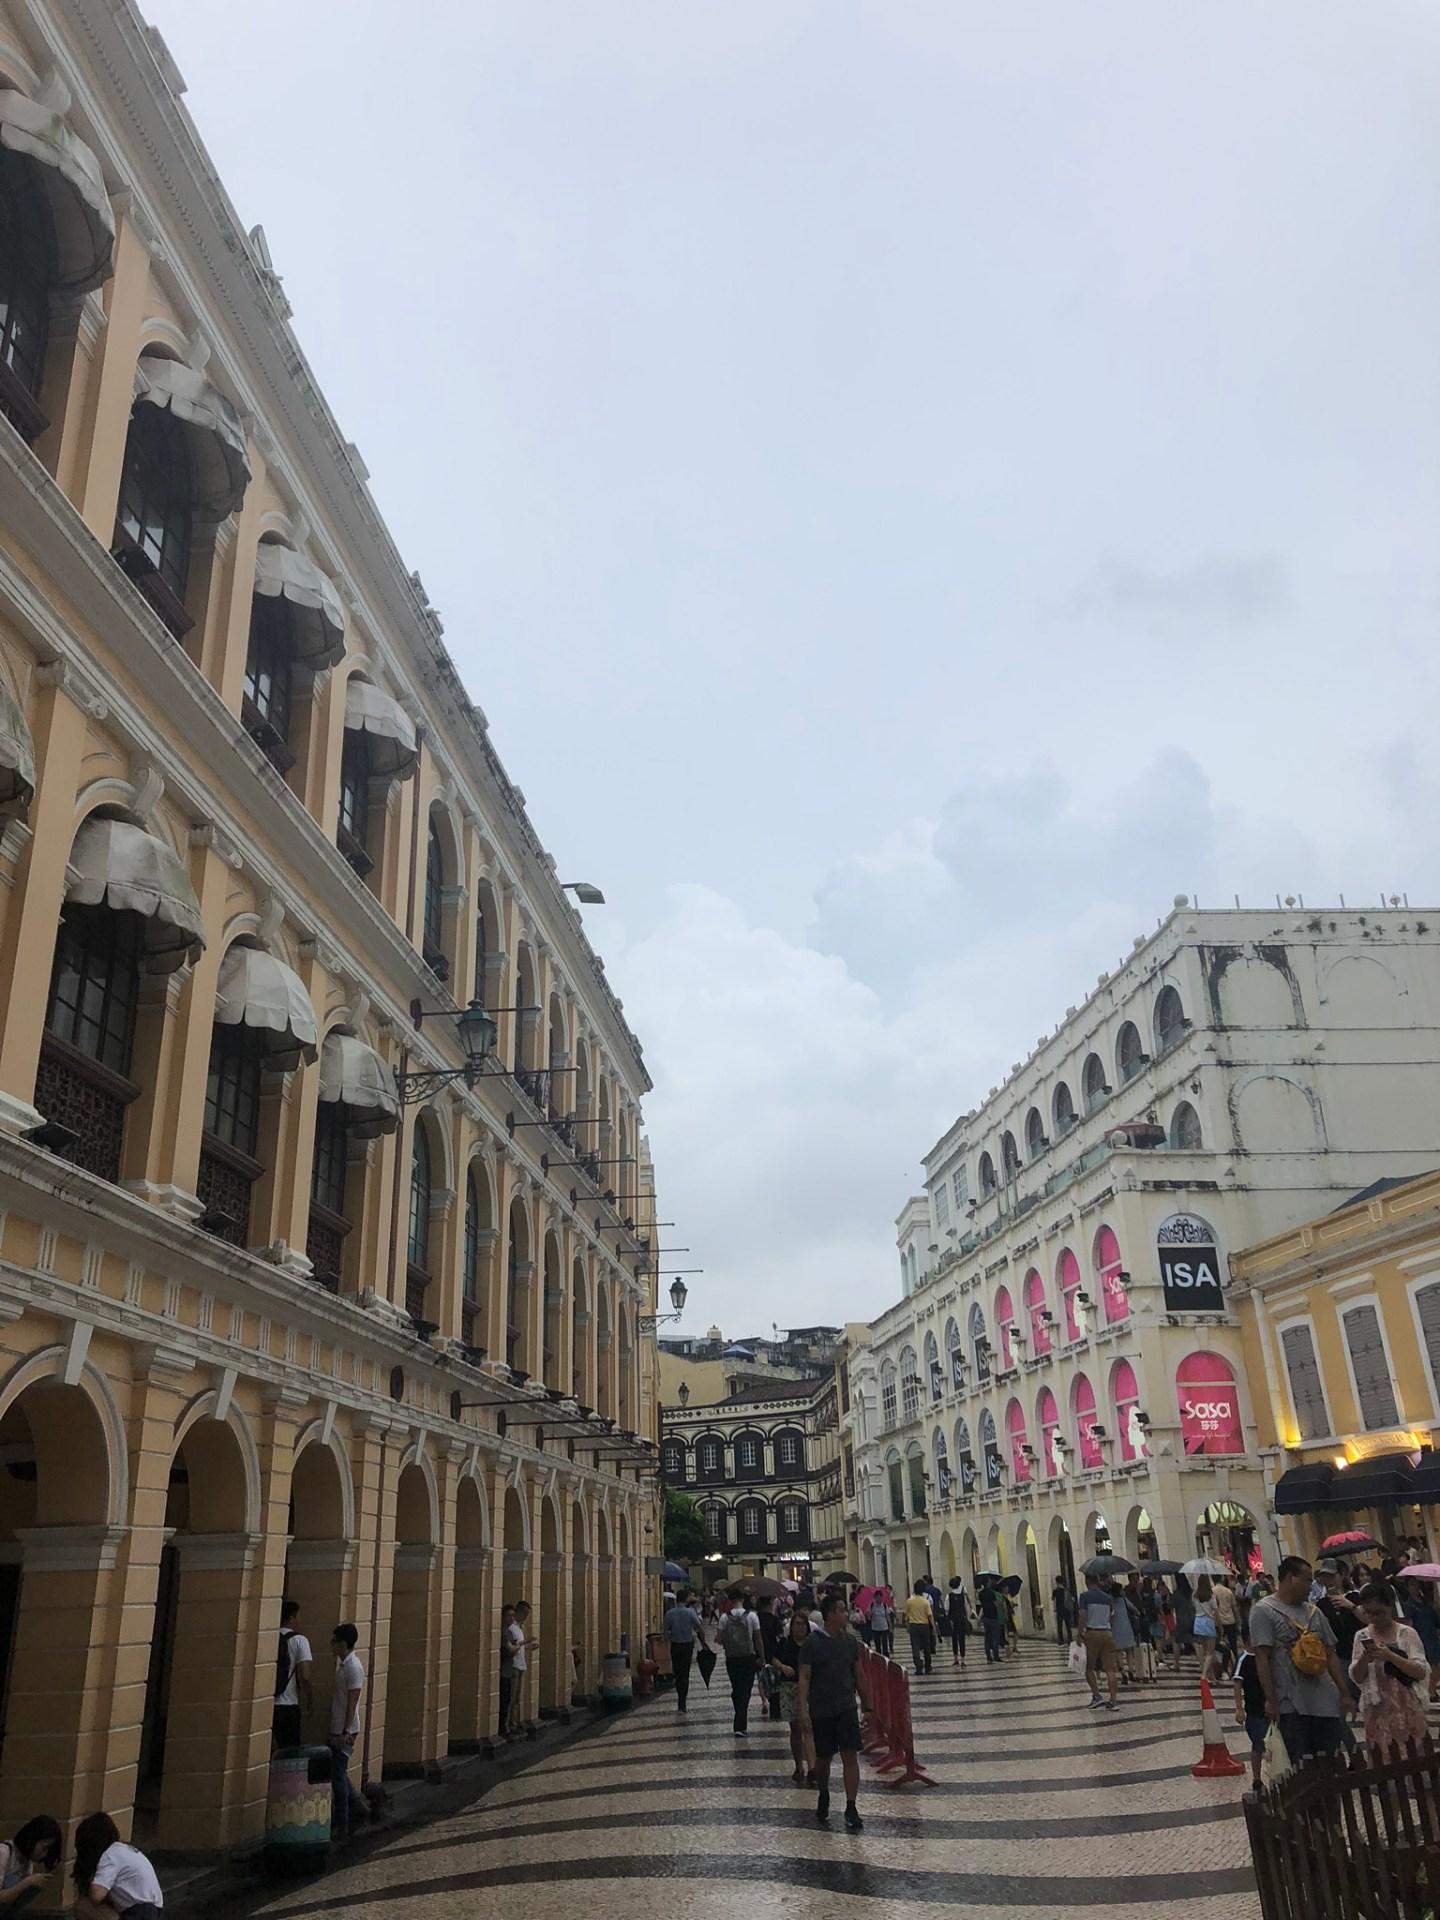 Senado Square, Macau, China